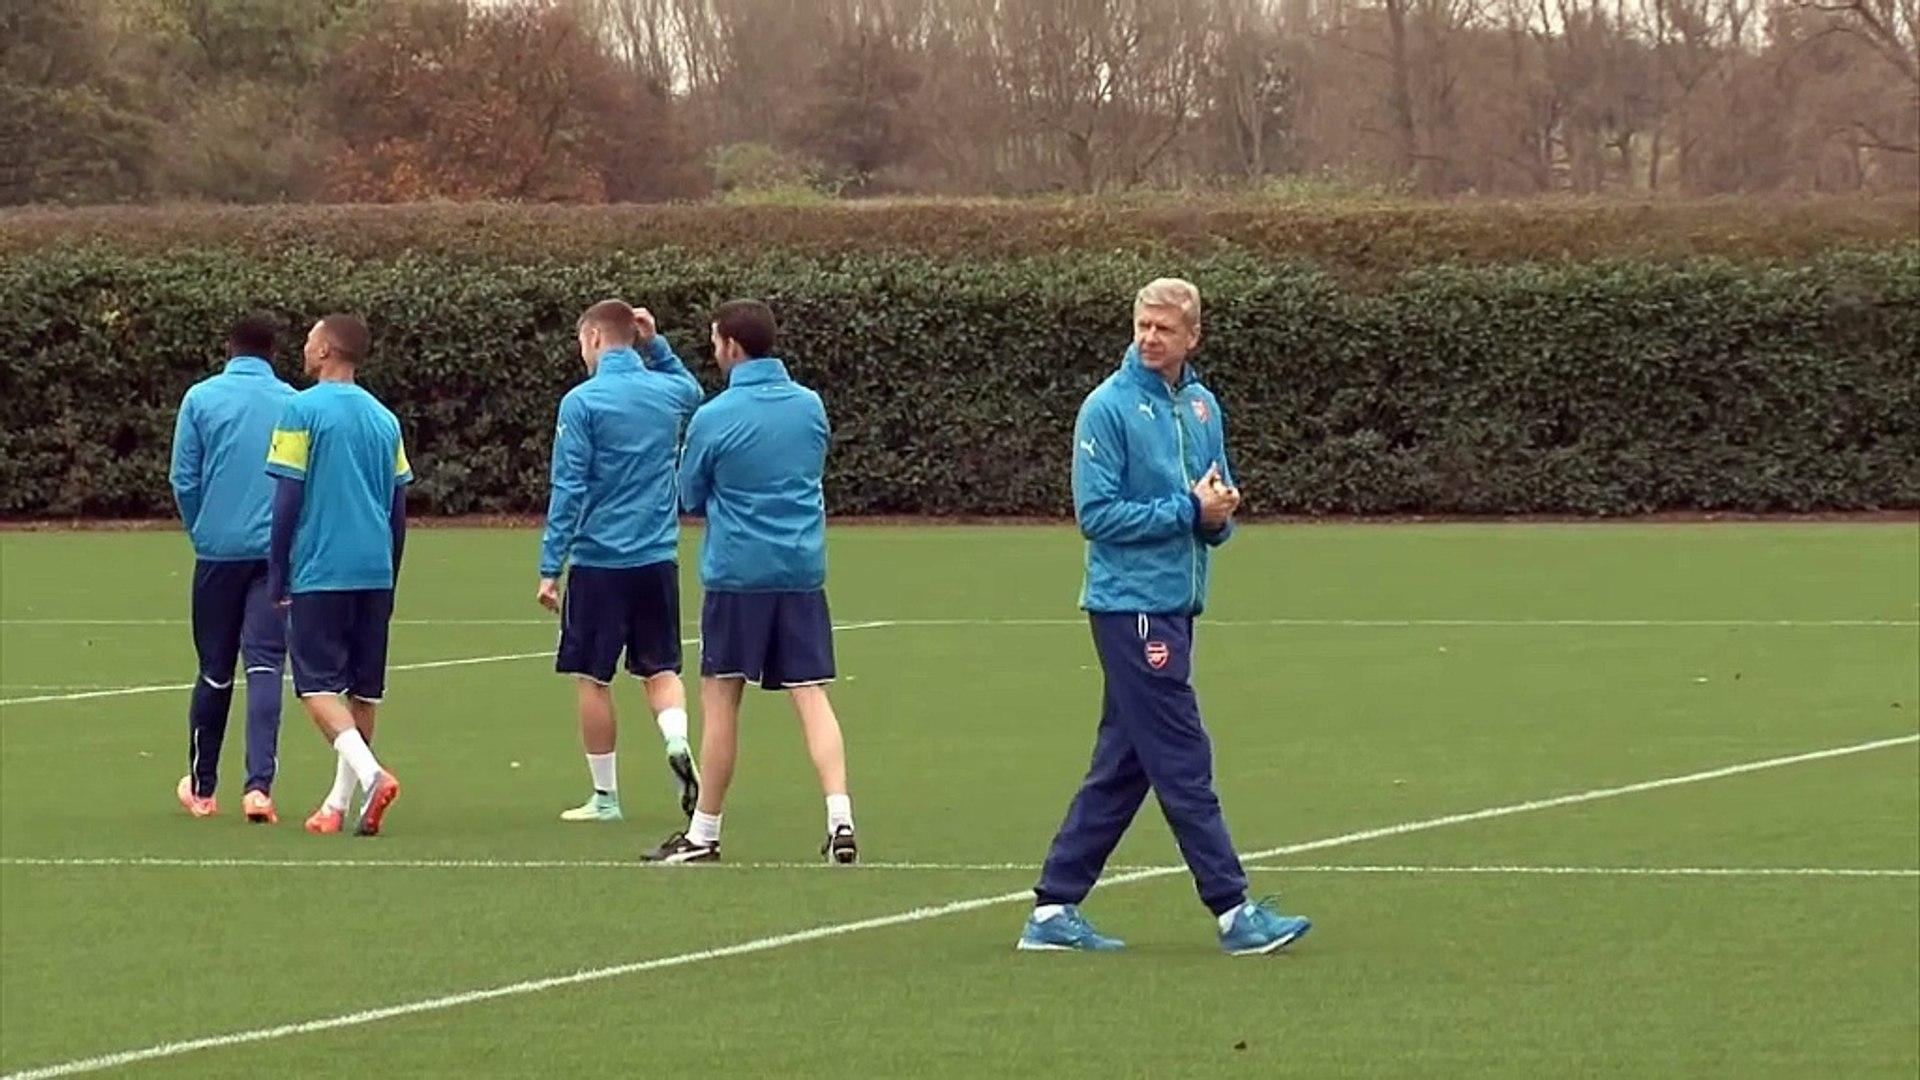 Arsenal leiht Sanogo nach Crystal Palace aus